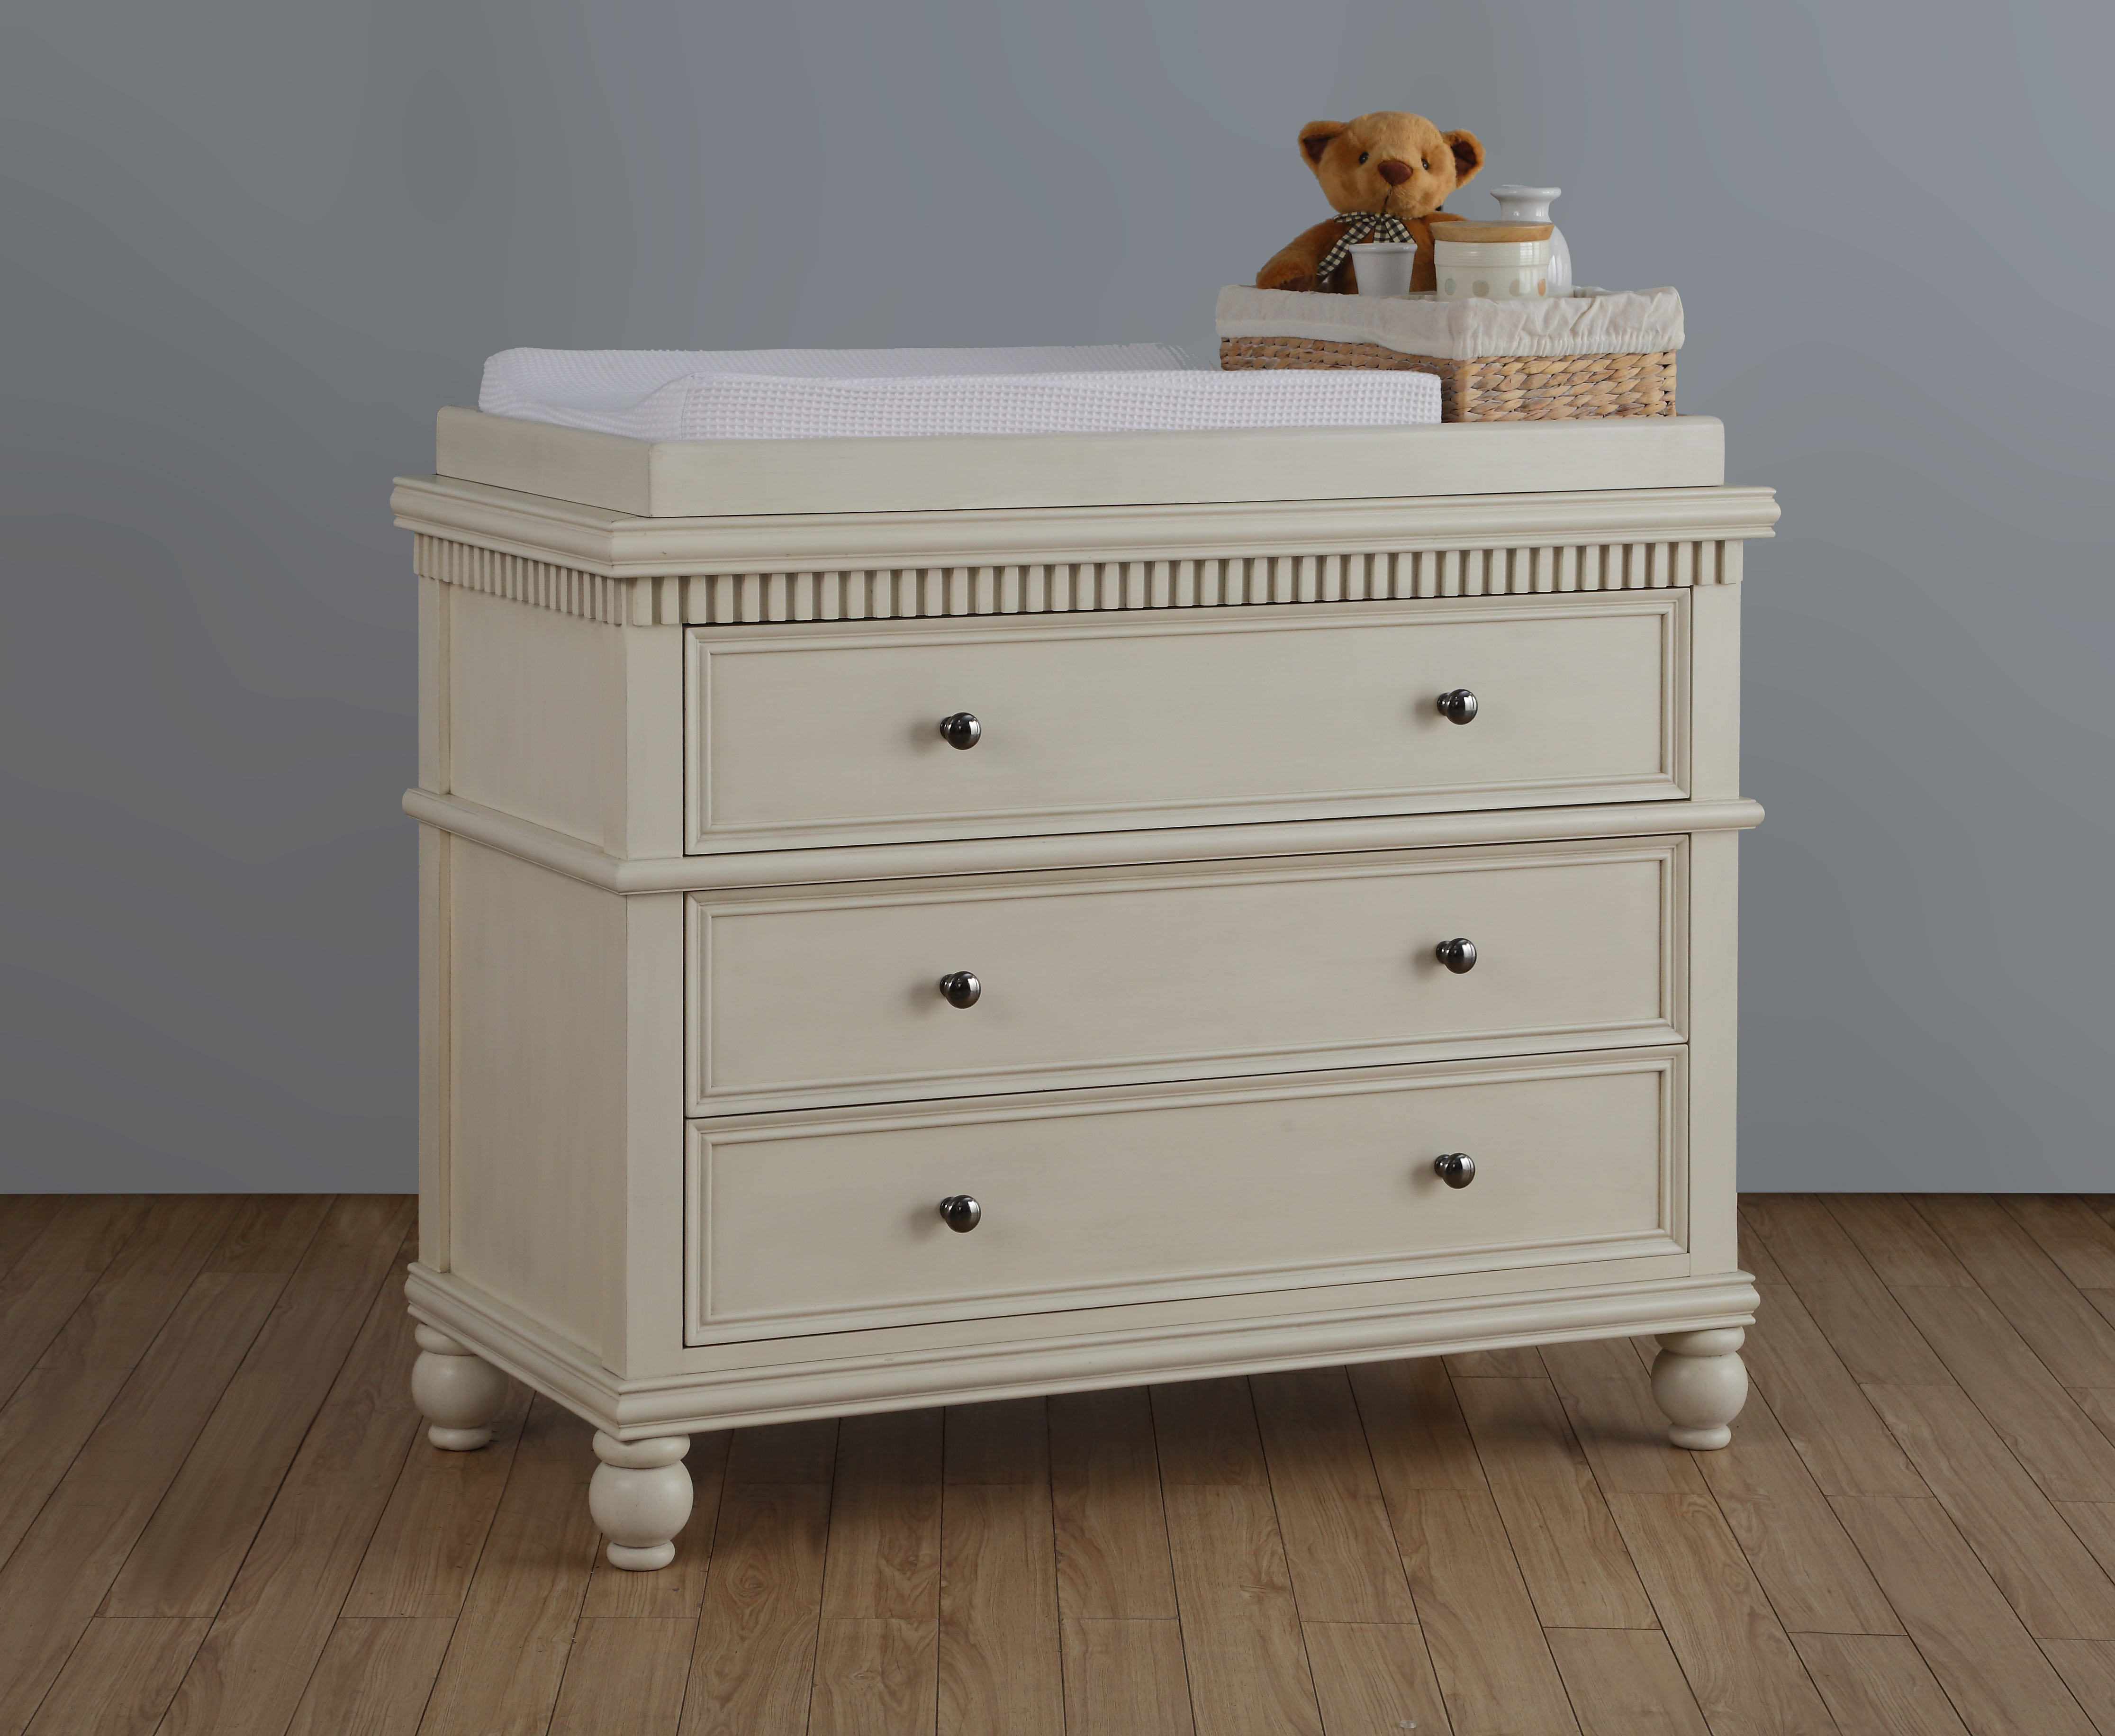 TeddyOne - Devon Dresser